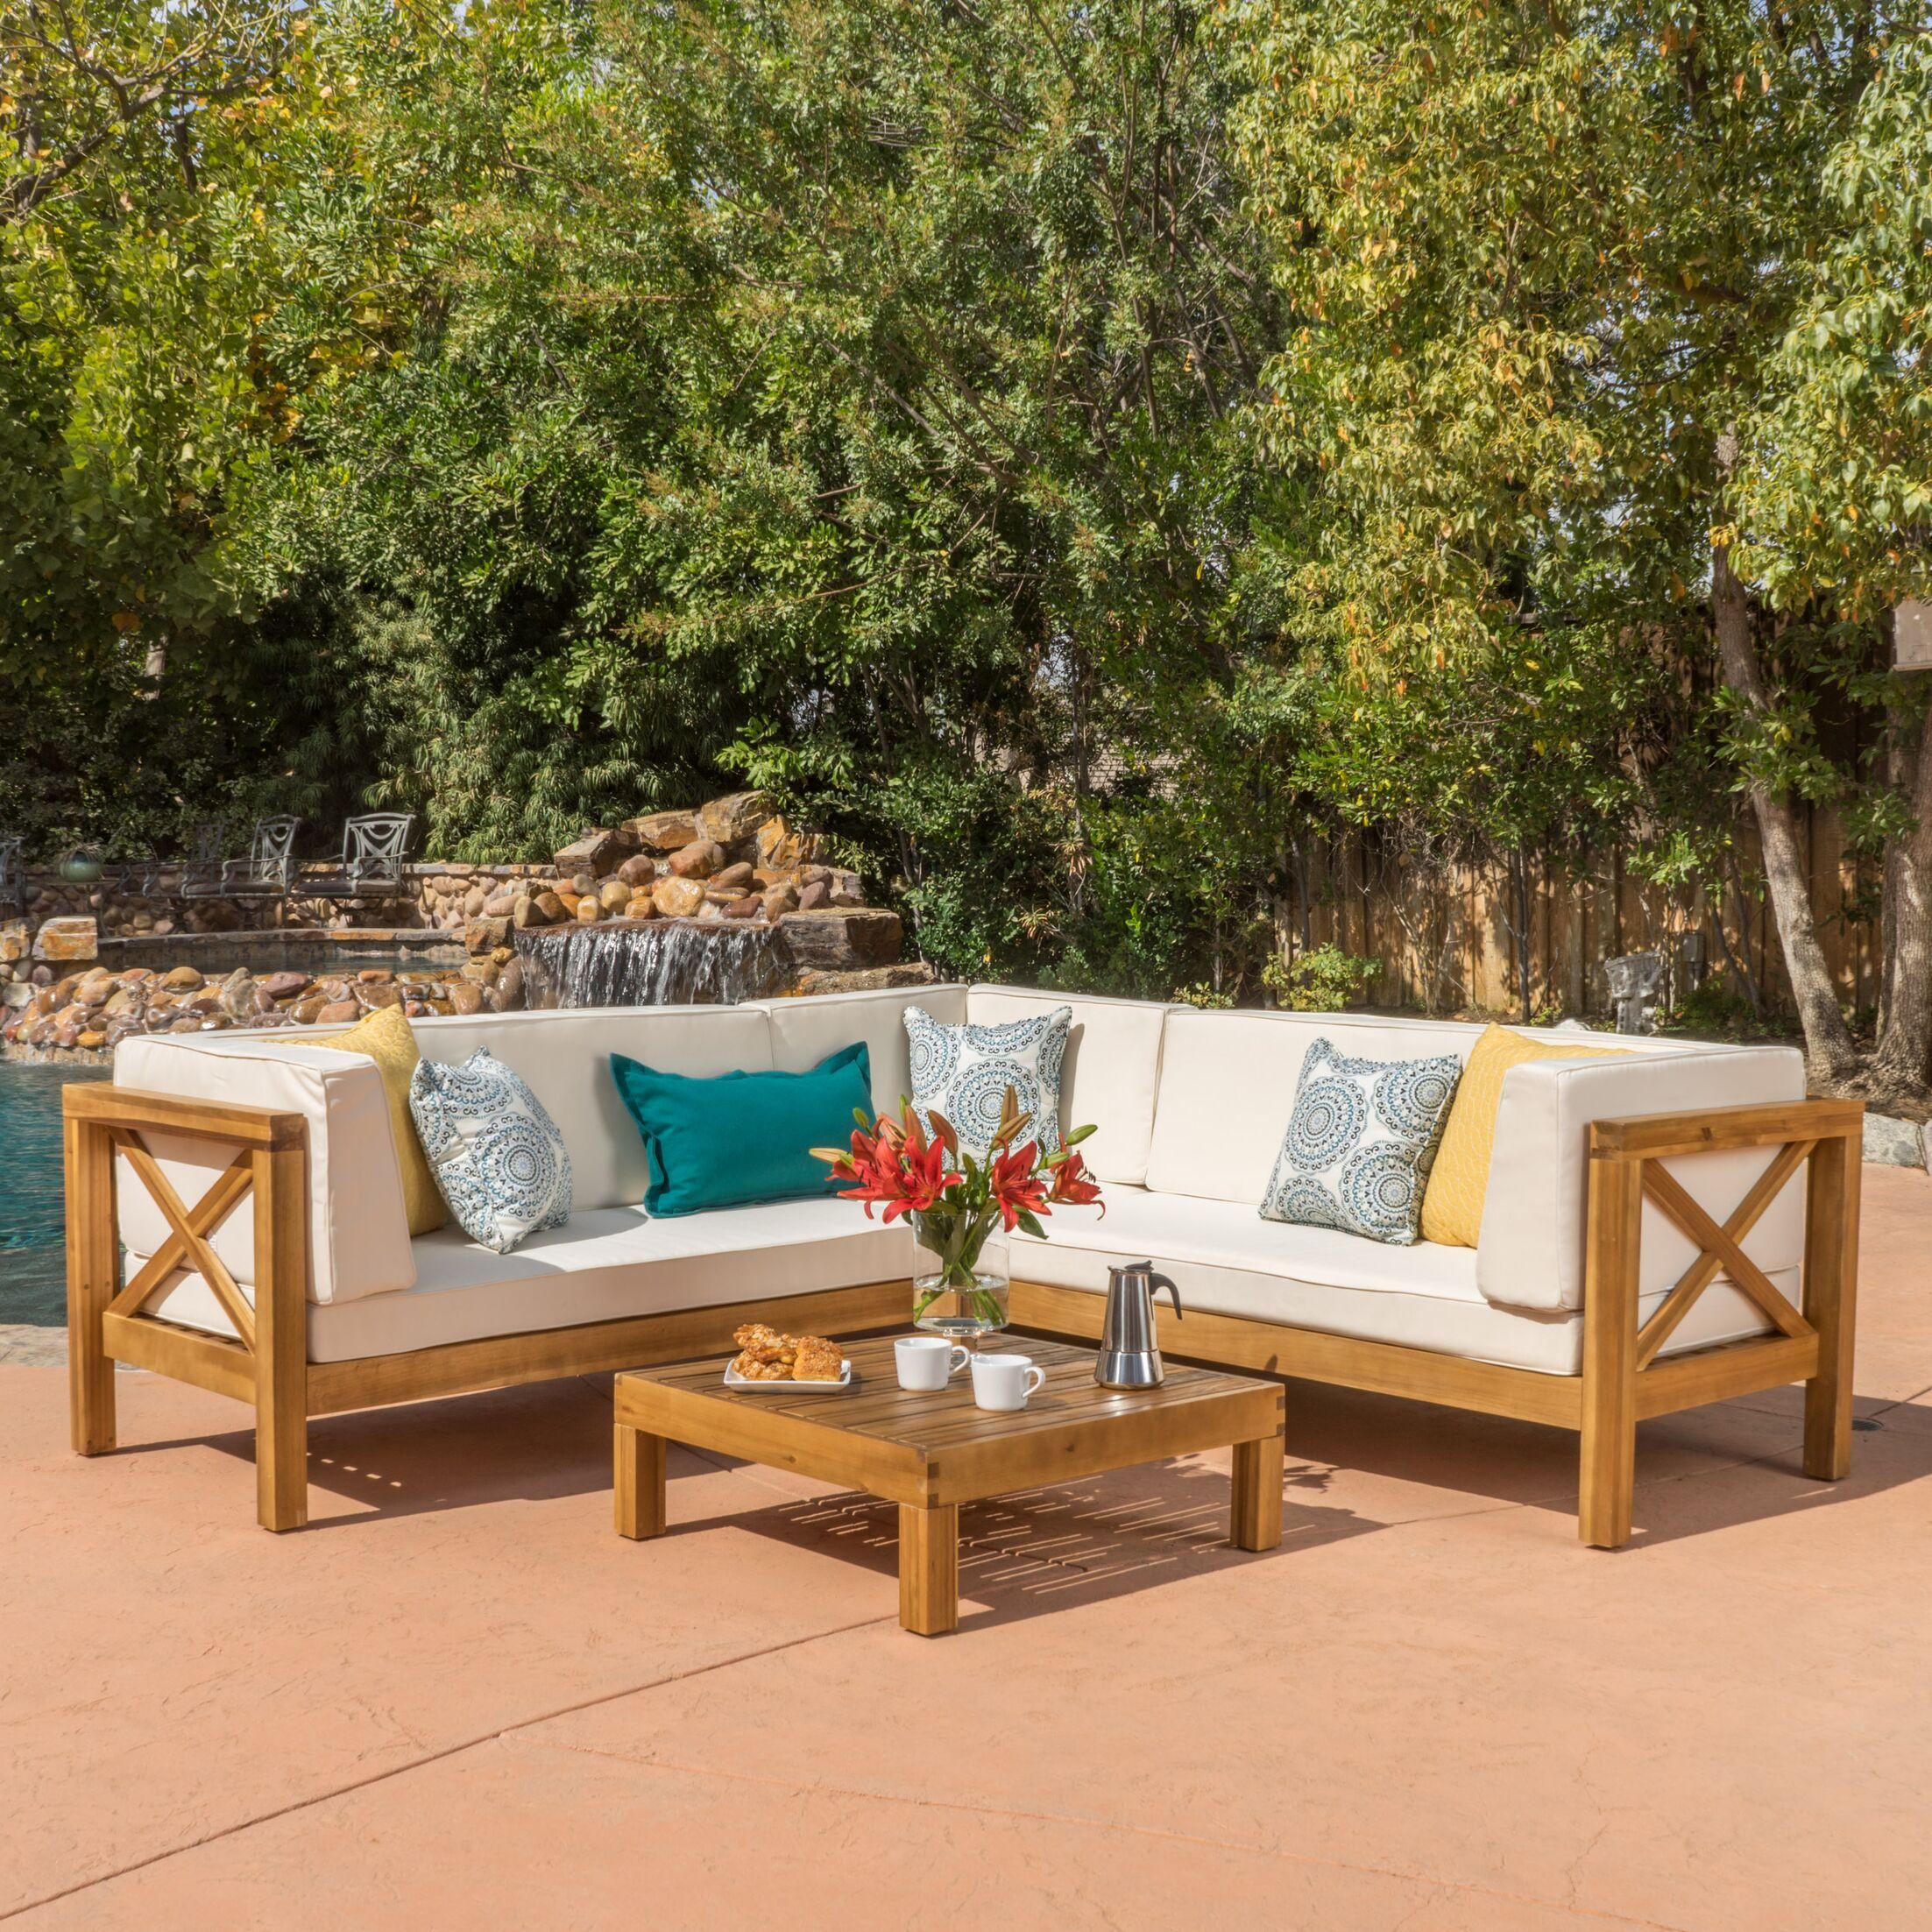 Lejeune 4 Piece Sofa Set with Cushions Fabric: Beige